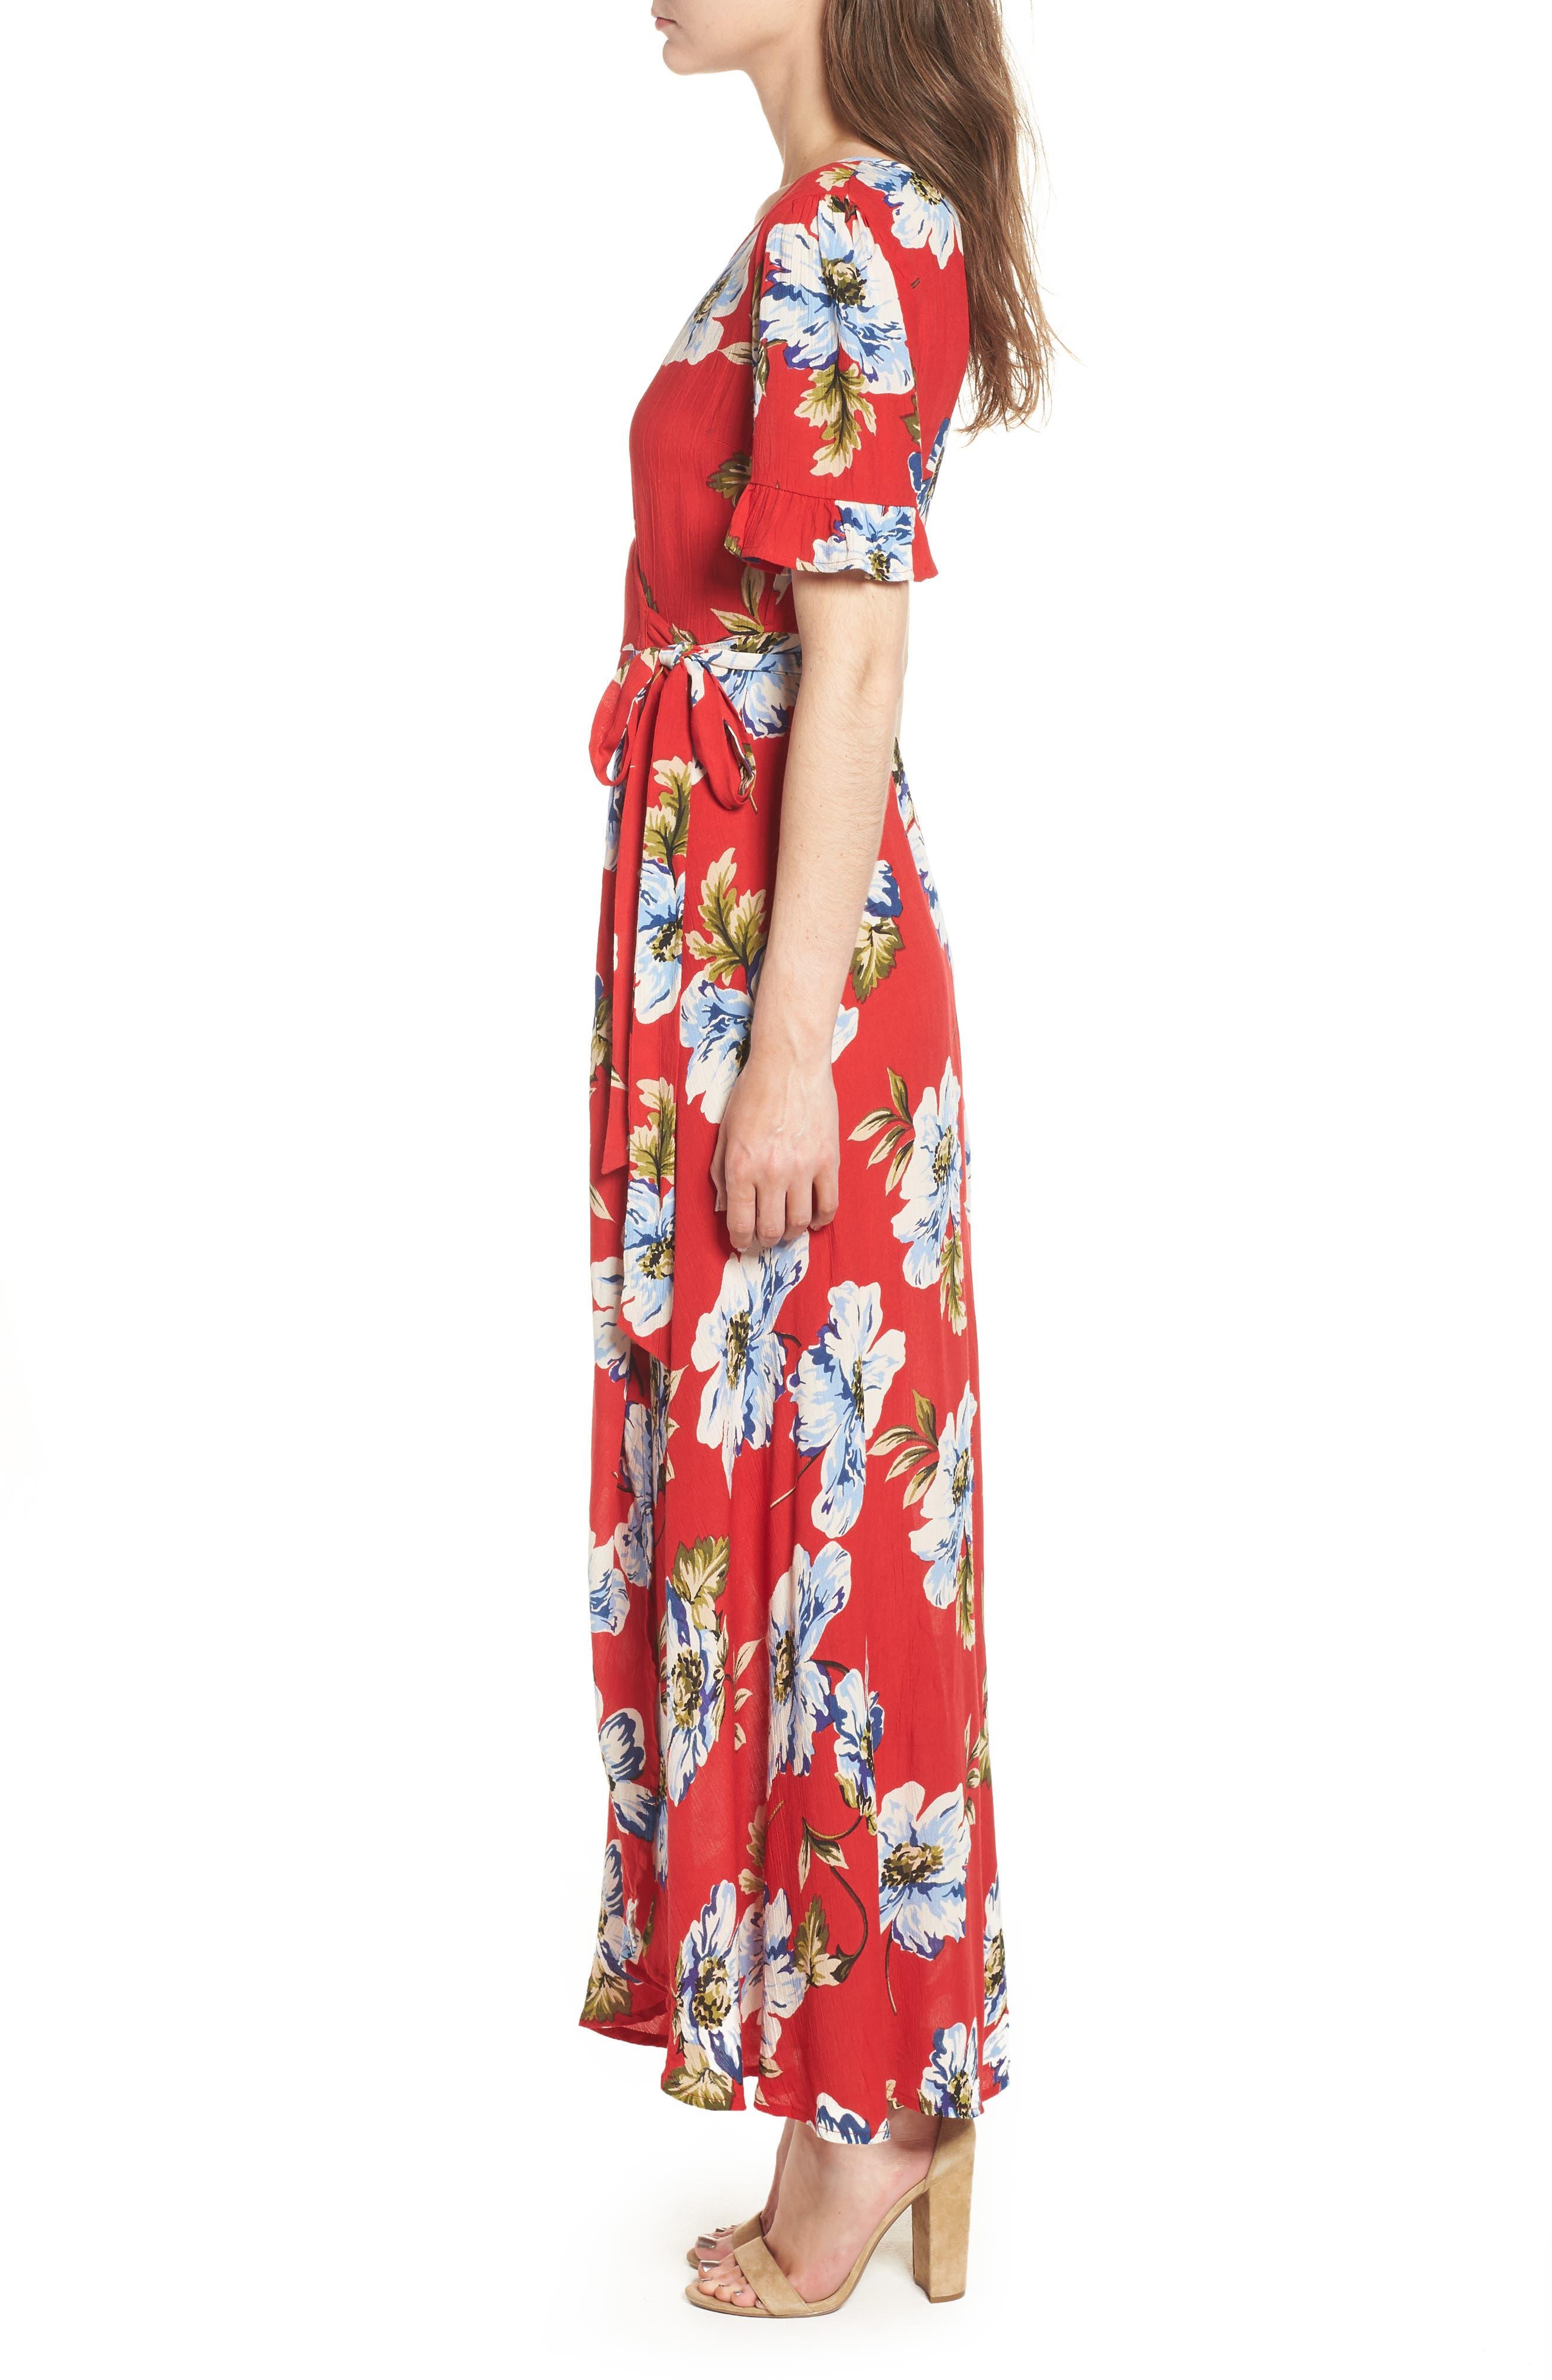 Blue Moon Floral Print Wrap Dress,                             Alternate thumbnail 3, color,                             Red/ Sky